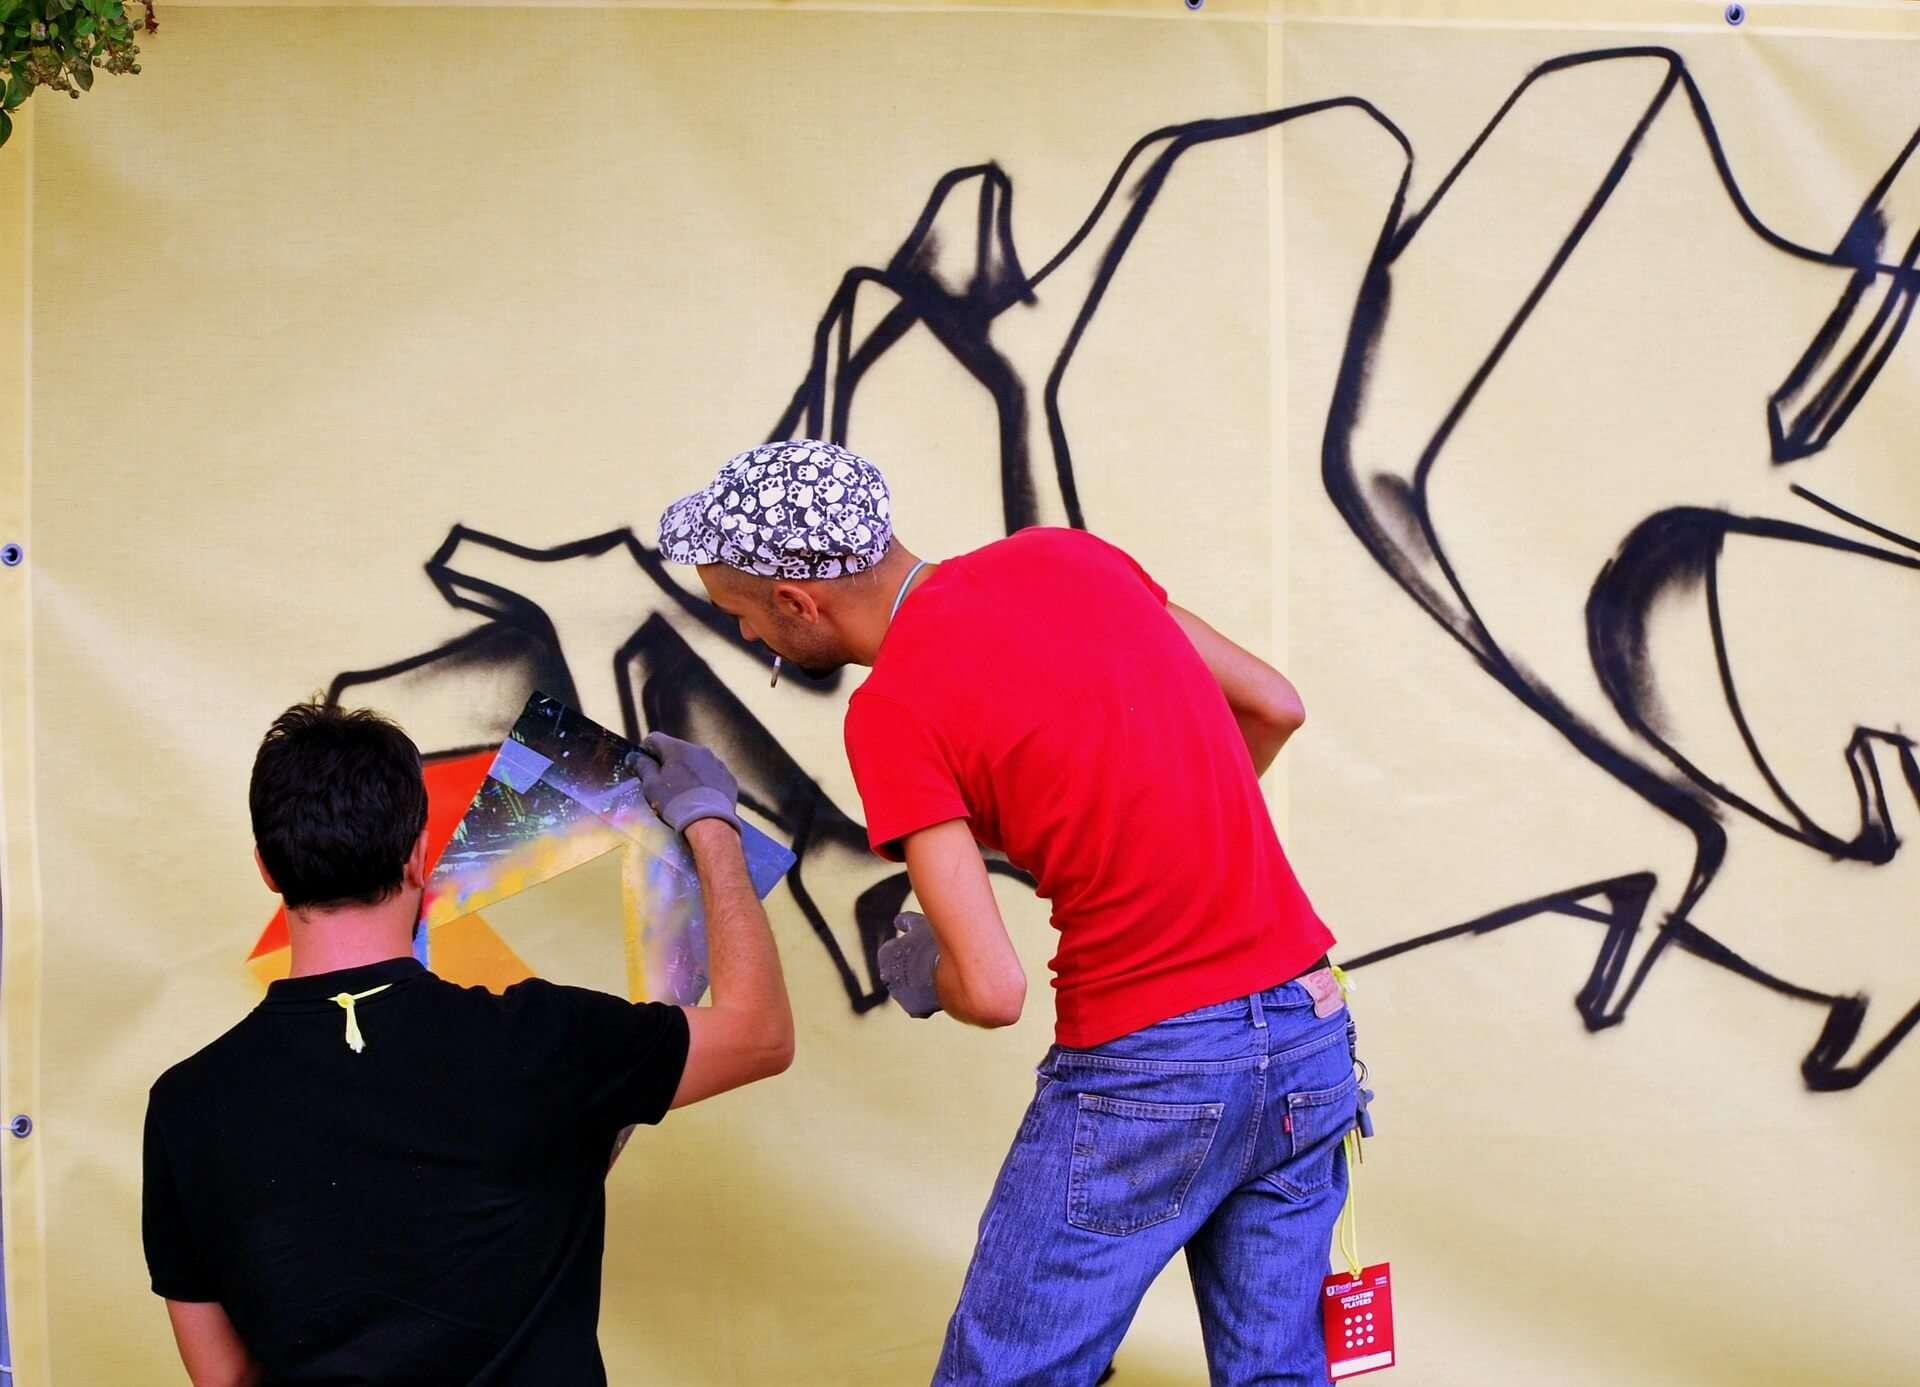 street art, spray, writer